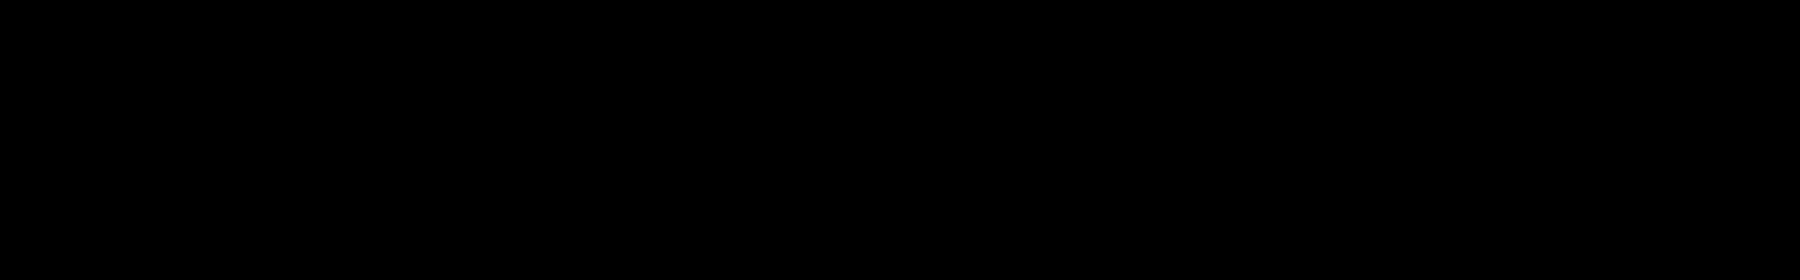 Synthmorph – Zebralette MARS audio waveform